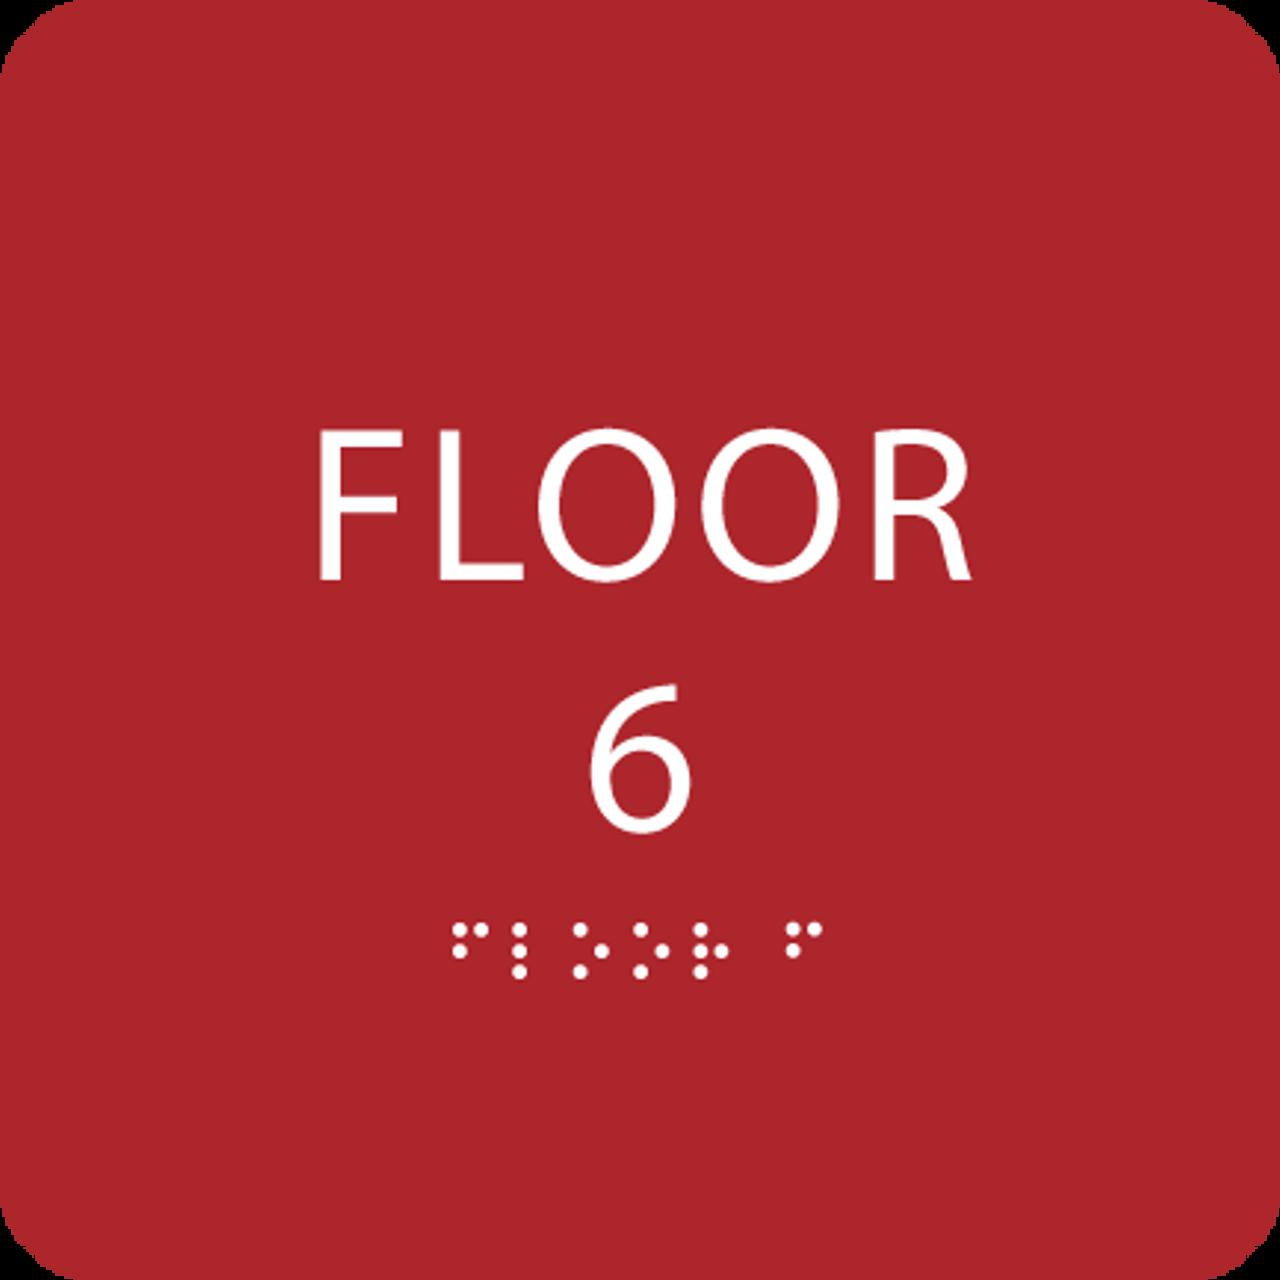 Red Floor 6 Level Identification ADA Sign